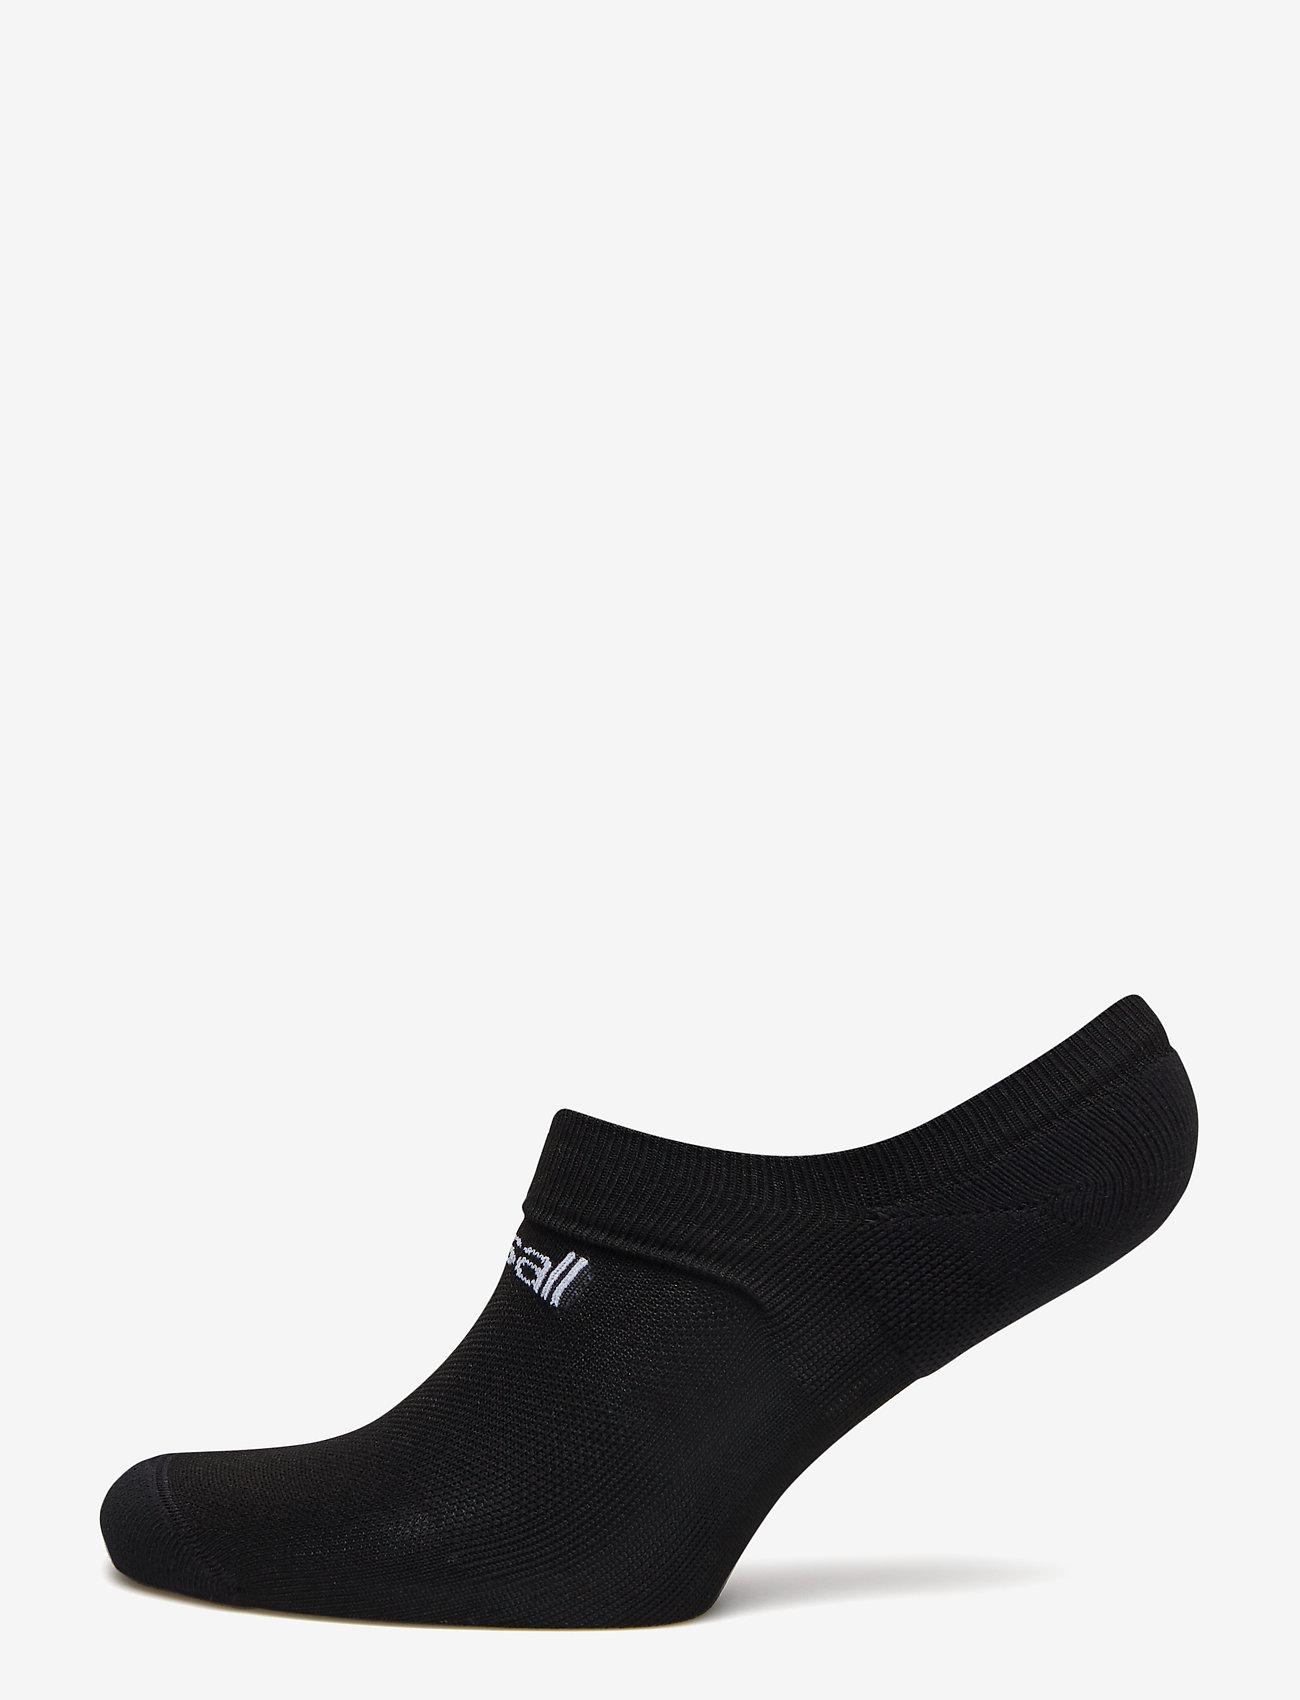 Casall - Traning sock - skarpetki do tenisówek - black - 0